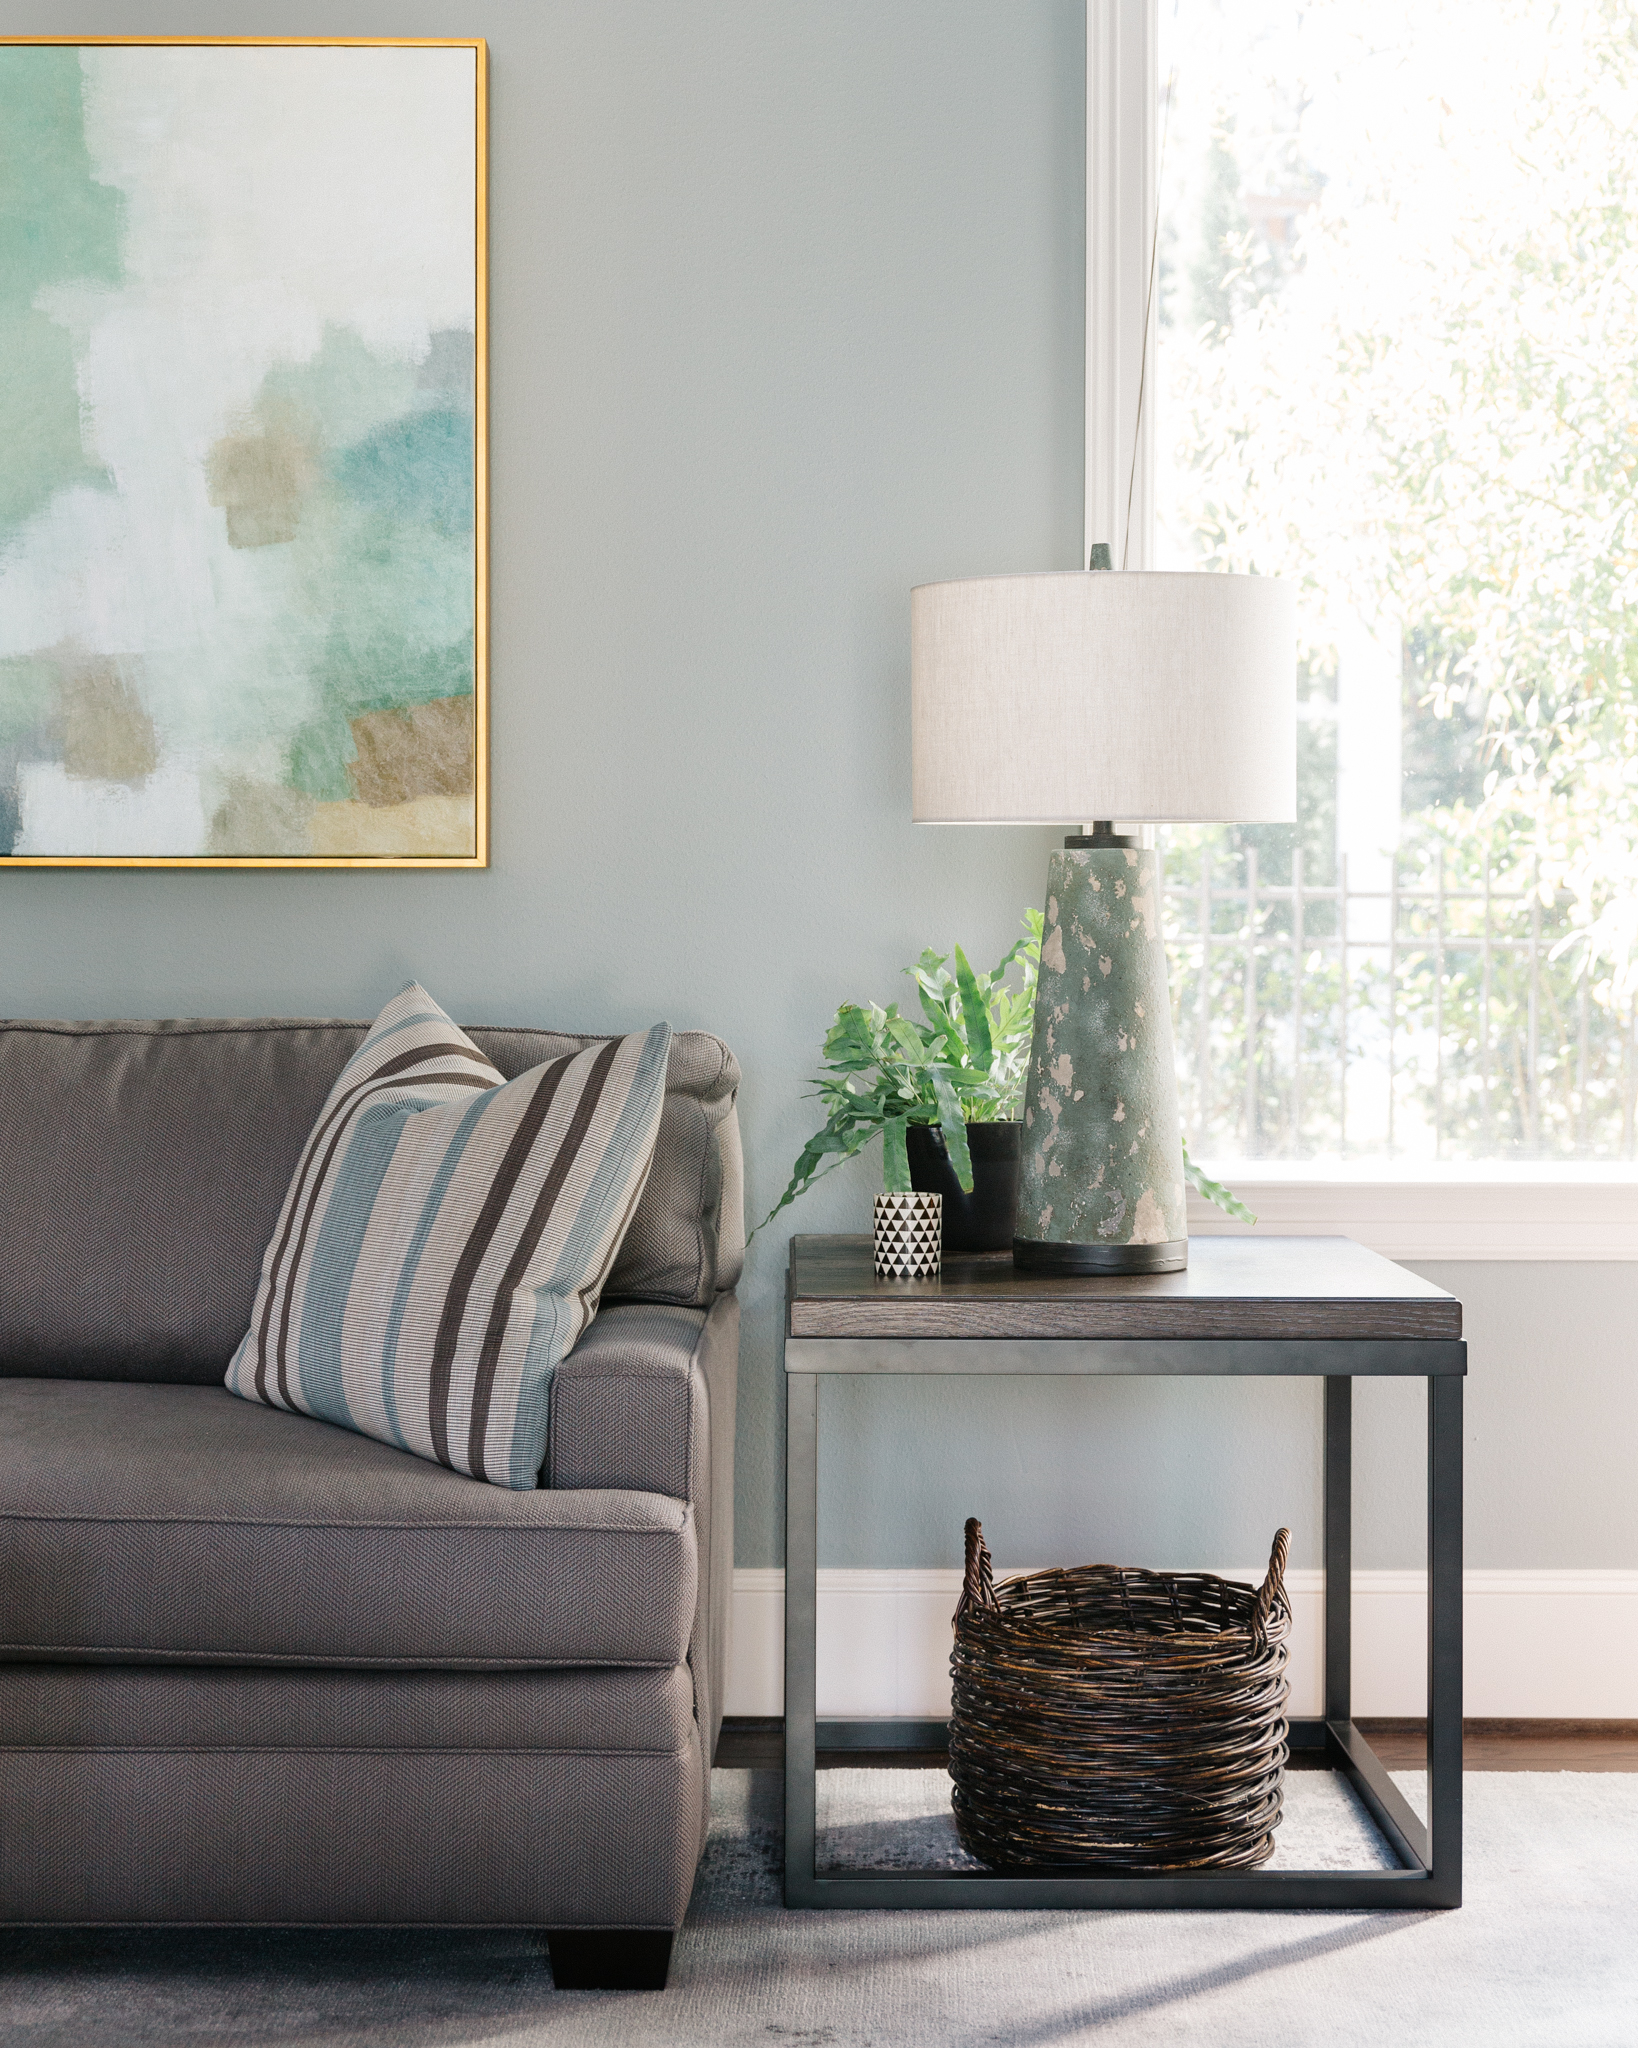 Project Reveal - Family room, backyard oasis, breakfast room | Carla Aston, Designer | Colleen Scott, Photographer | #familyroom #familyroomideas